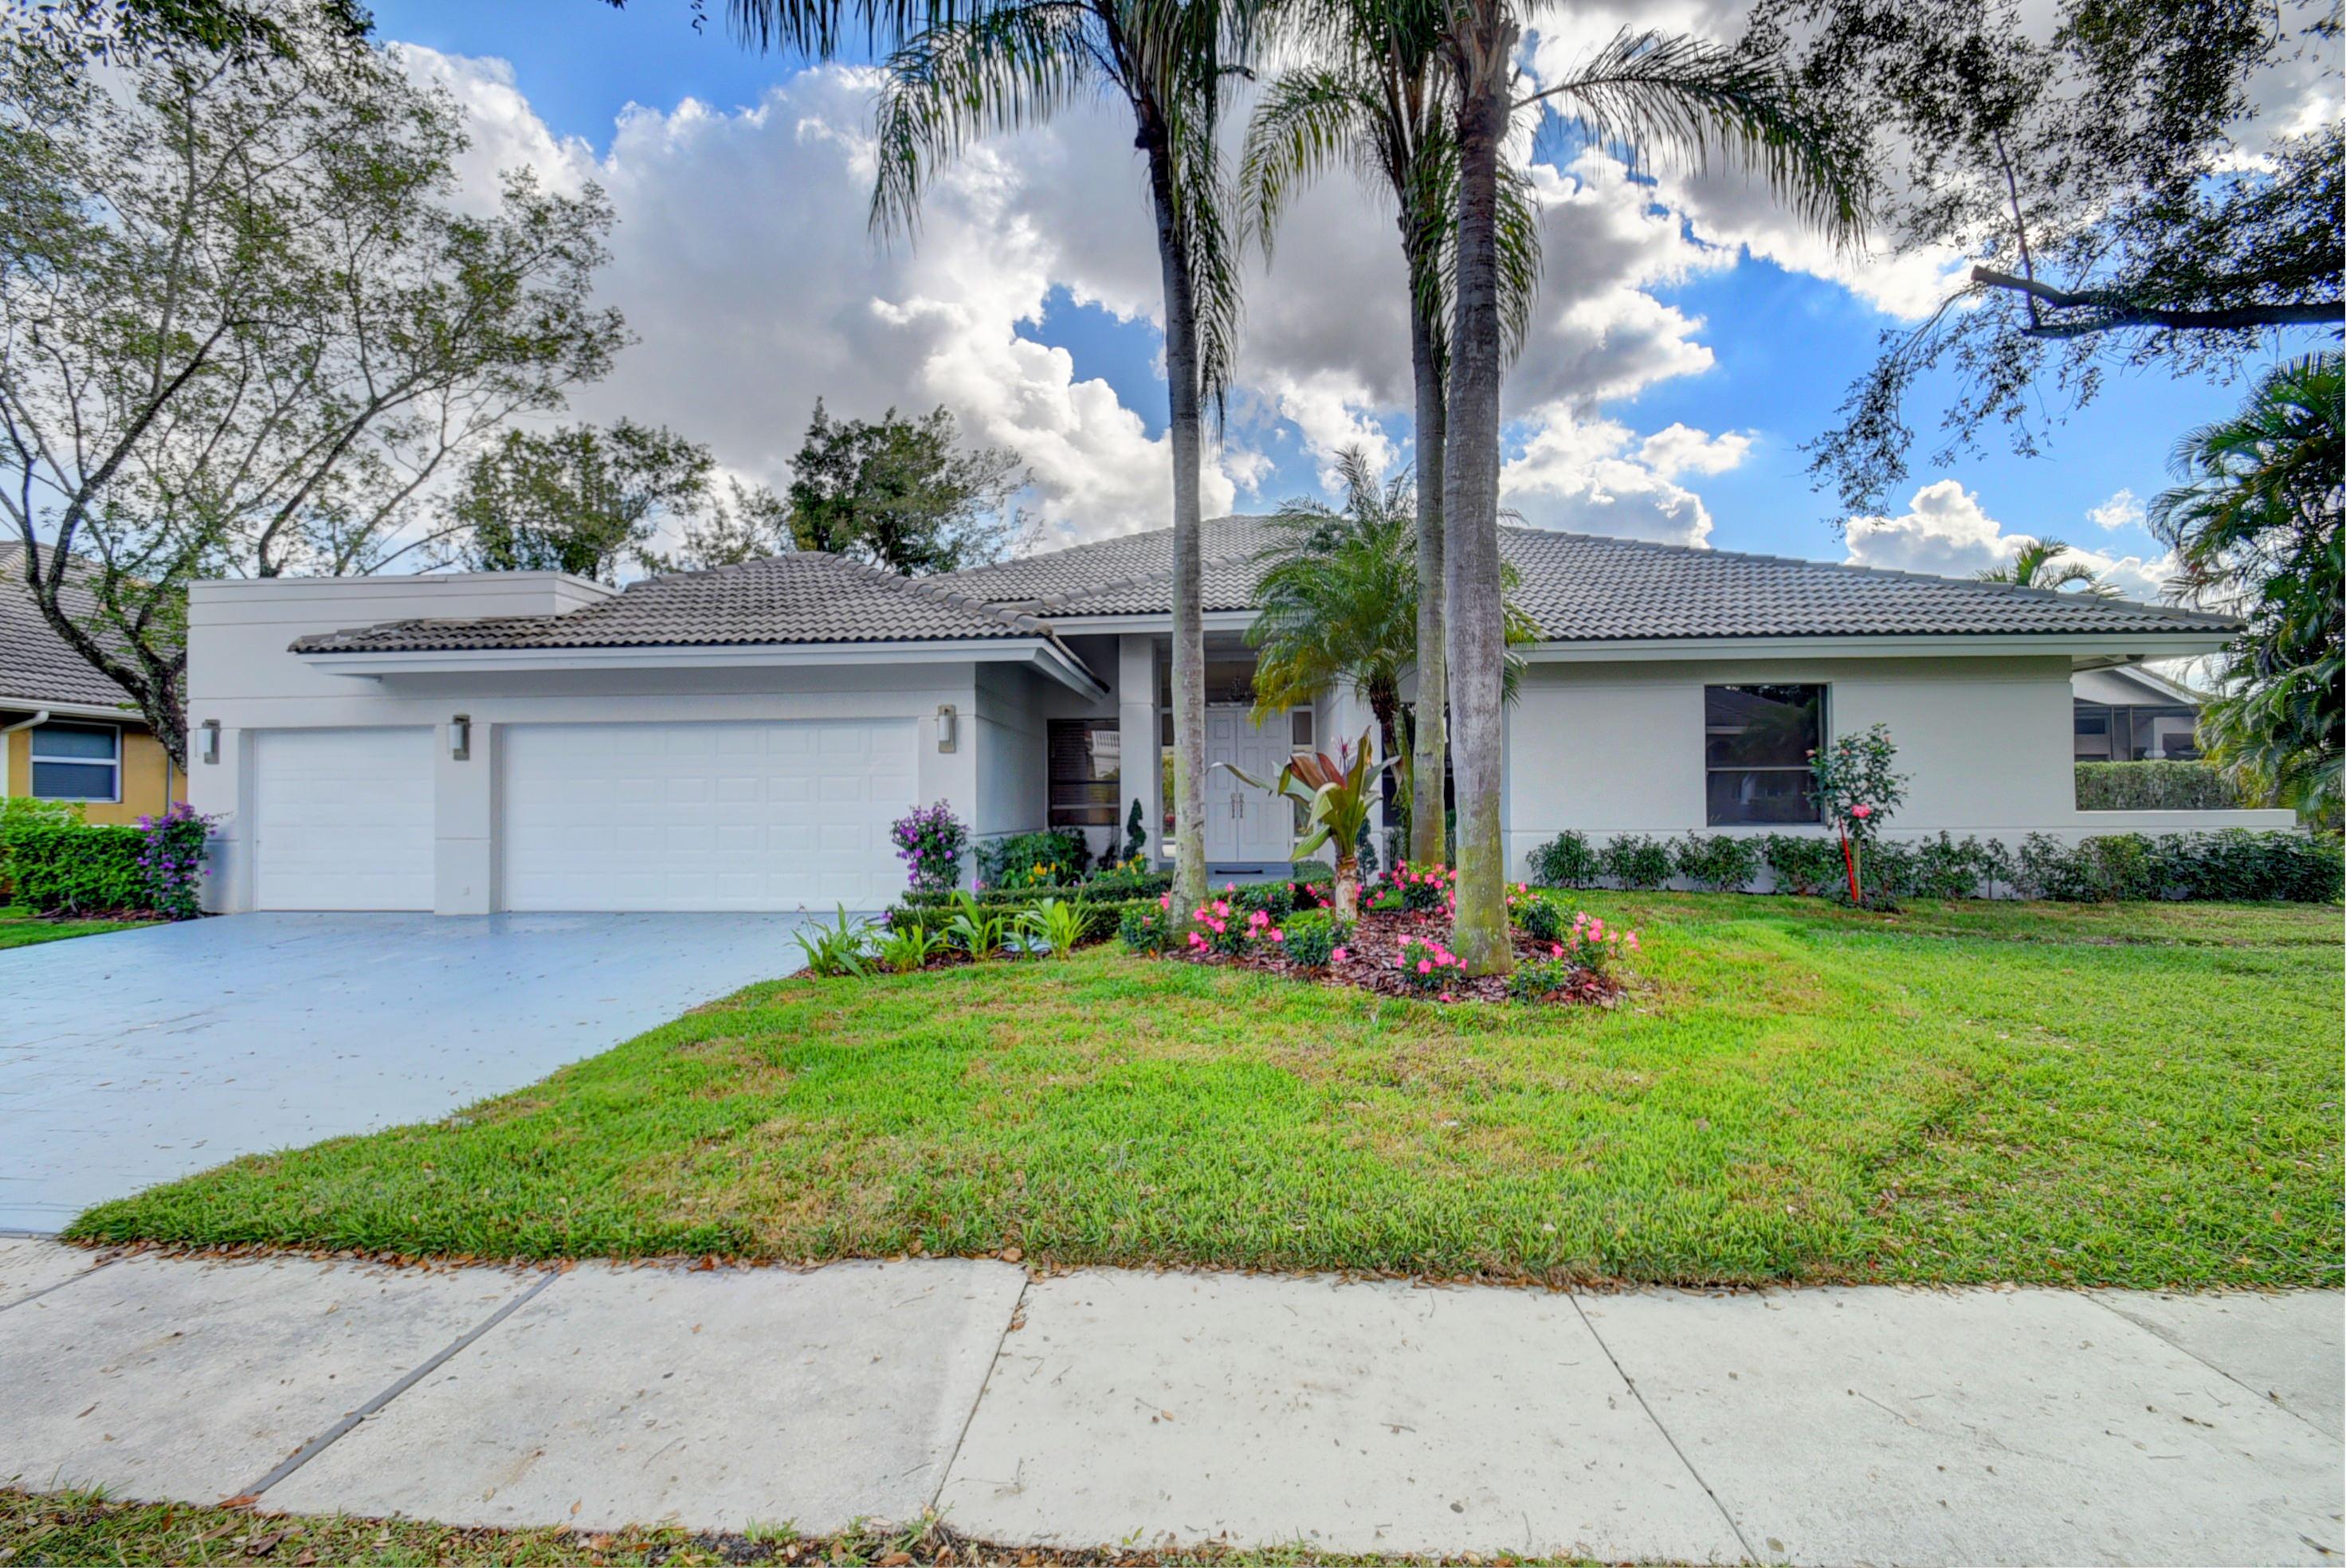 Photo of  Boca Raton, FL 33496 MLS RX-10454116